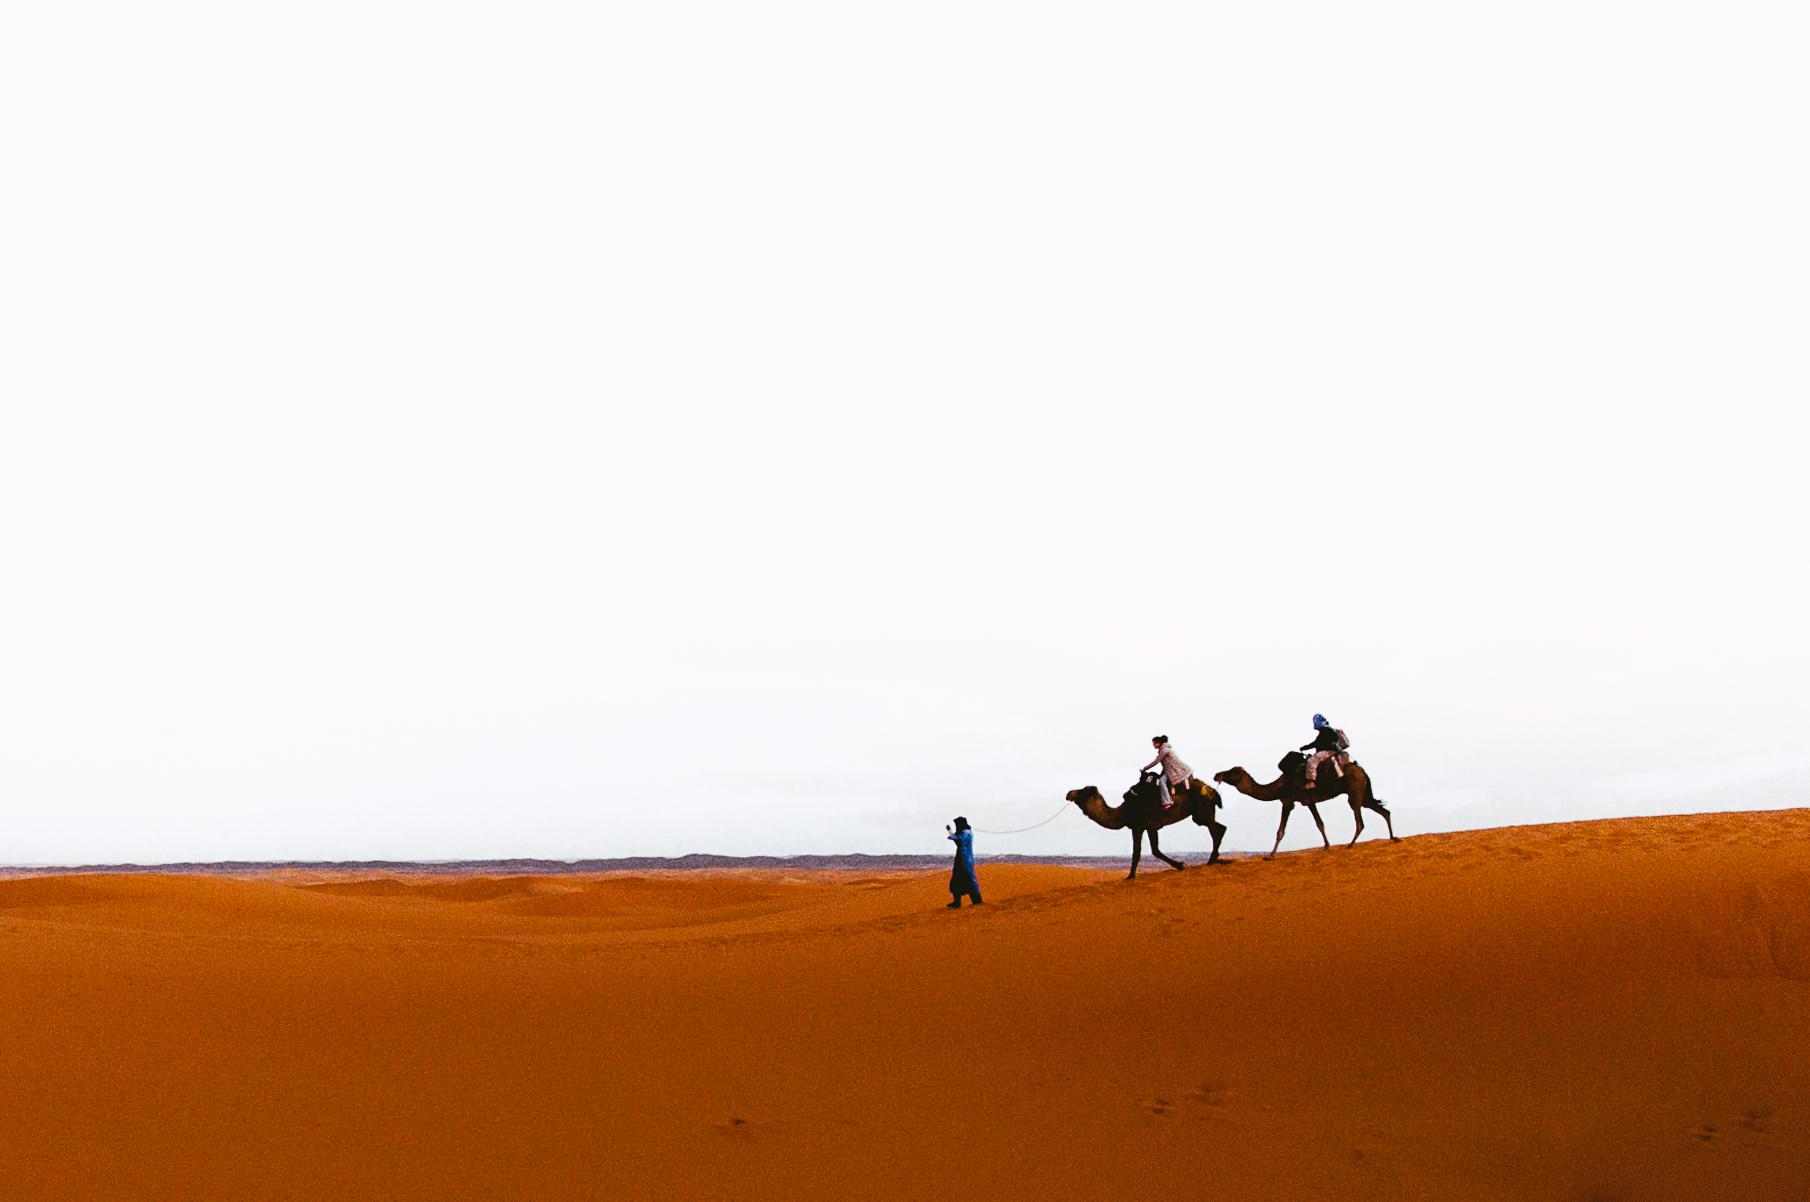 Camel trekking through the dunes.